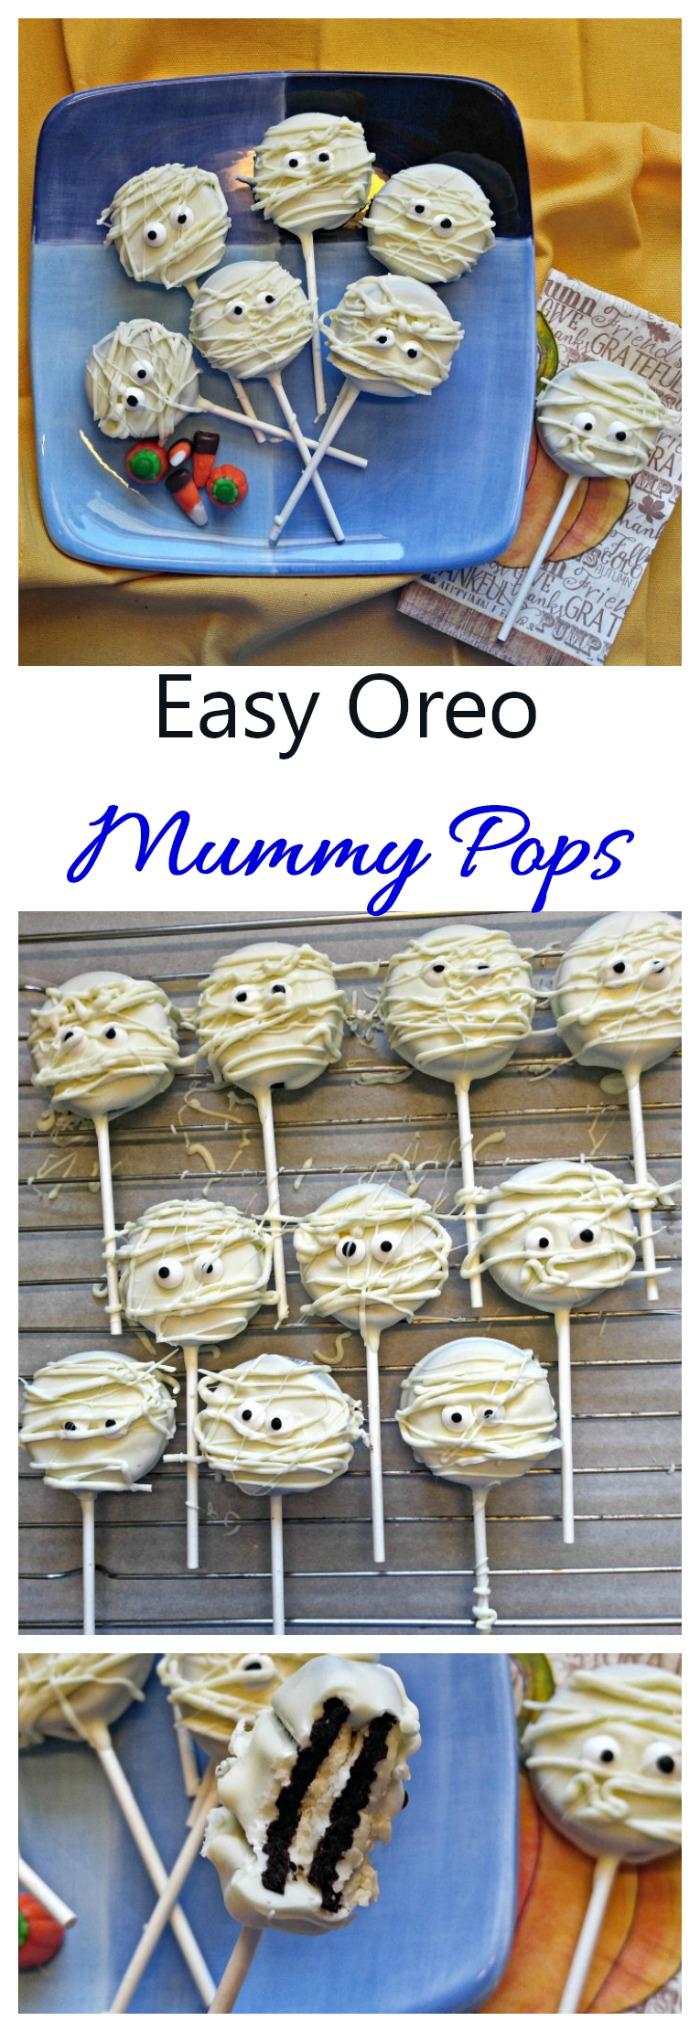 These Oreo mummy pops are super quick to make and taste amazing. #mummypops #halloweencookies